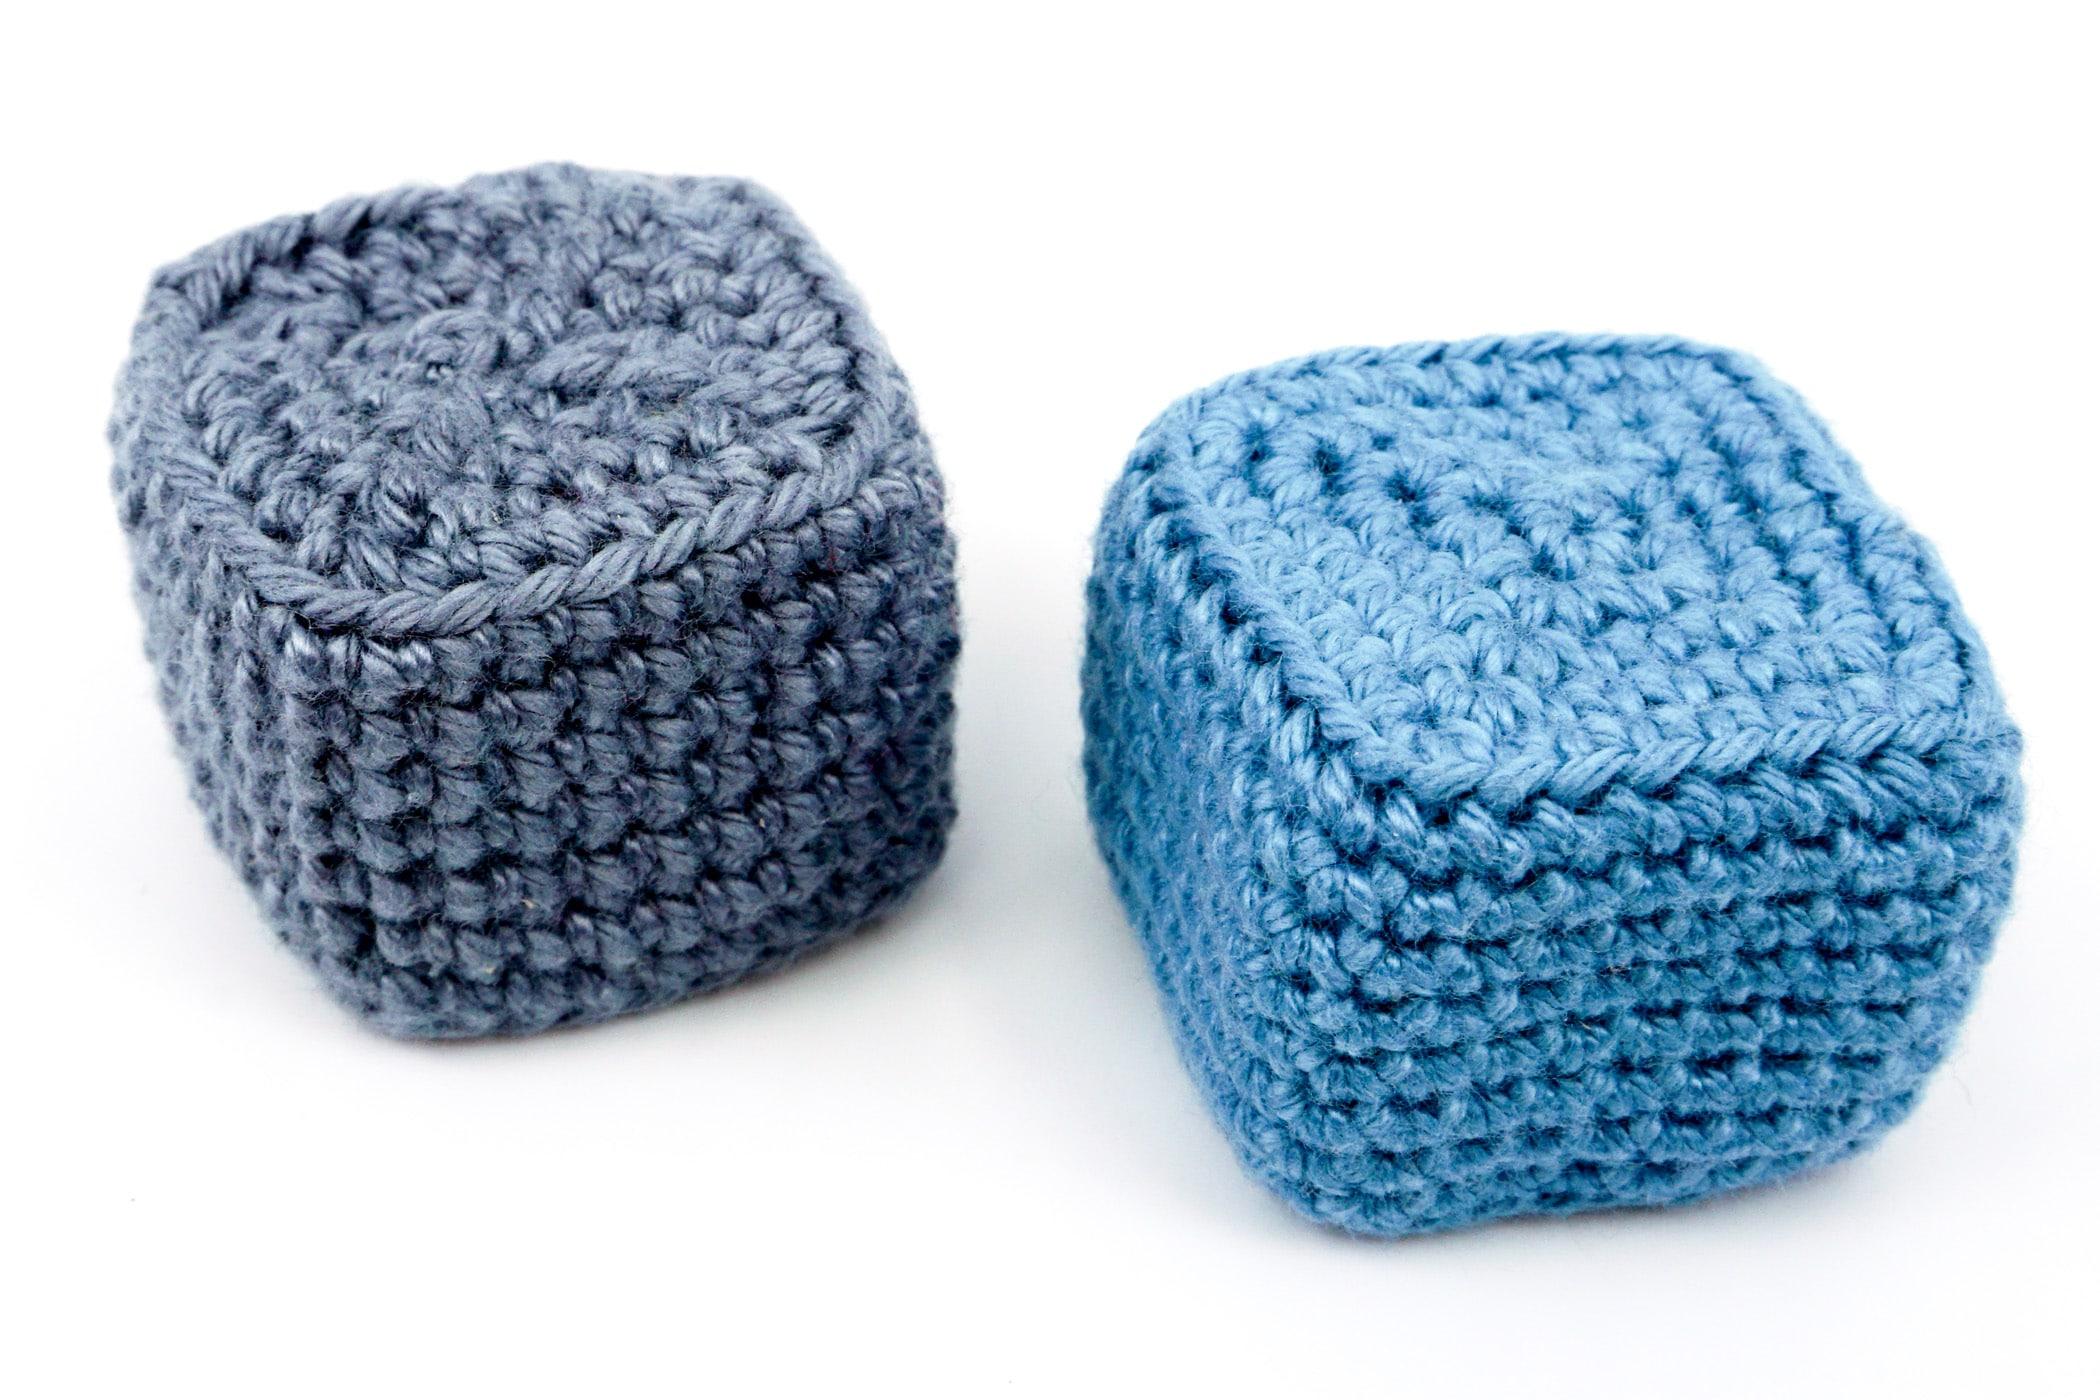 Crochet Kaleidoscope: Shifting Shapes and Shades Across 100 Motifs ... | 1400x2100